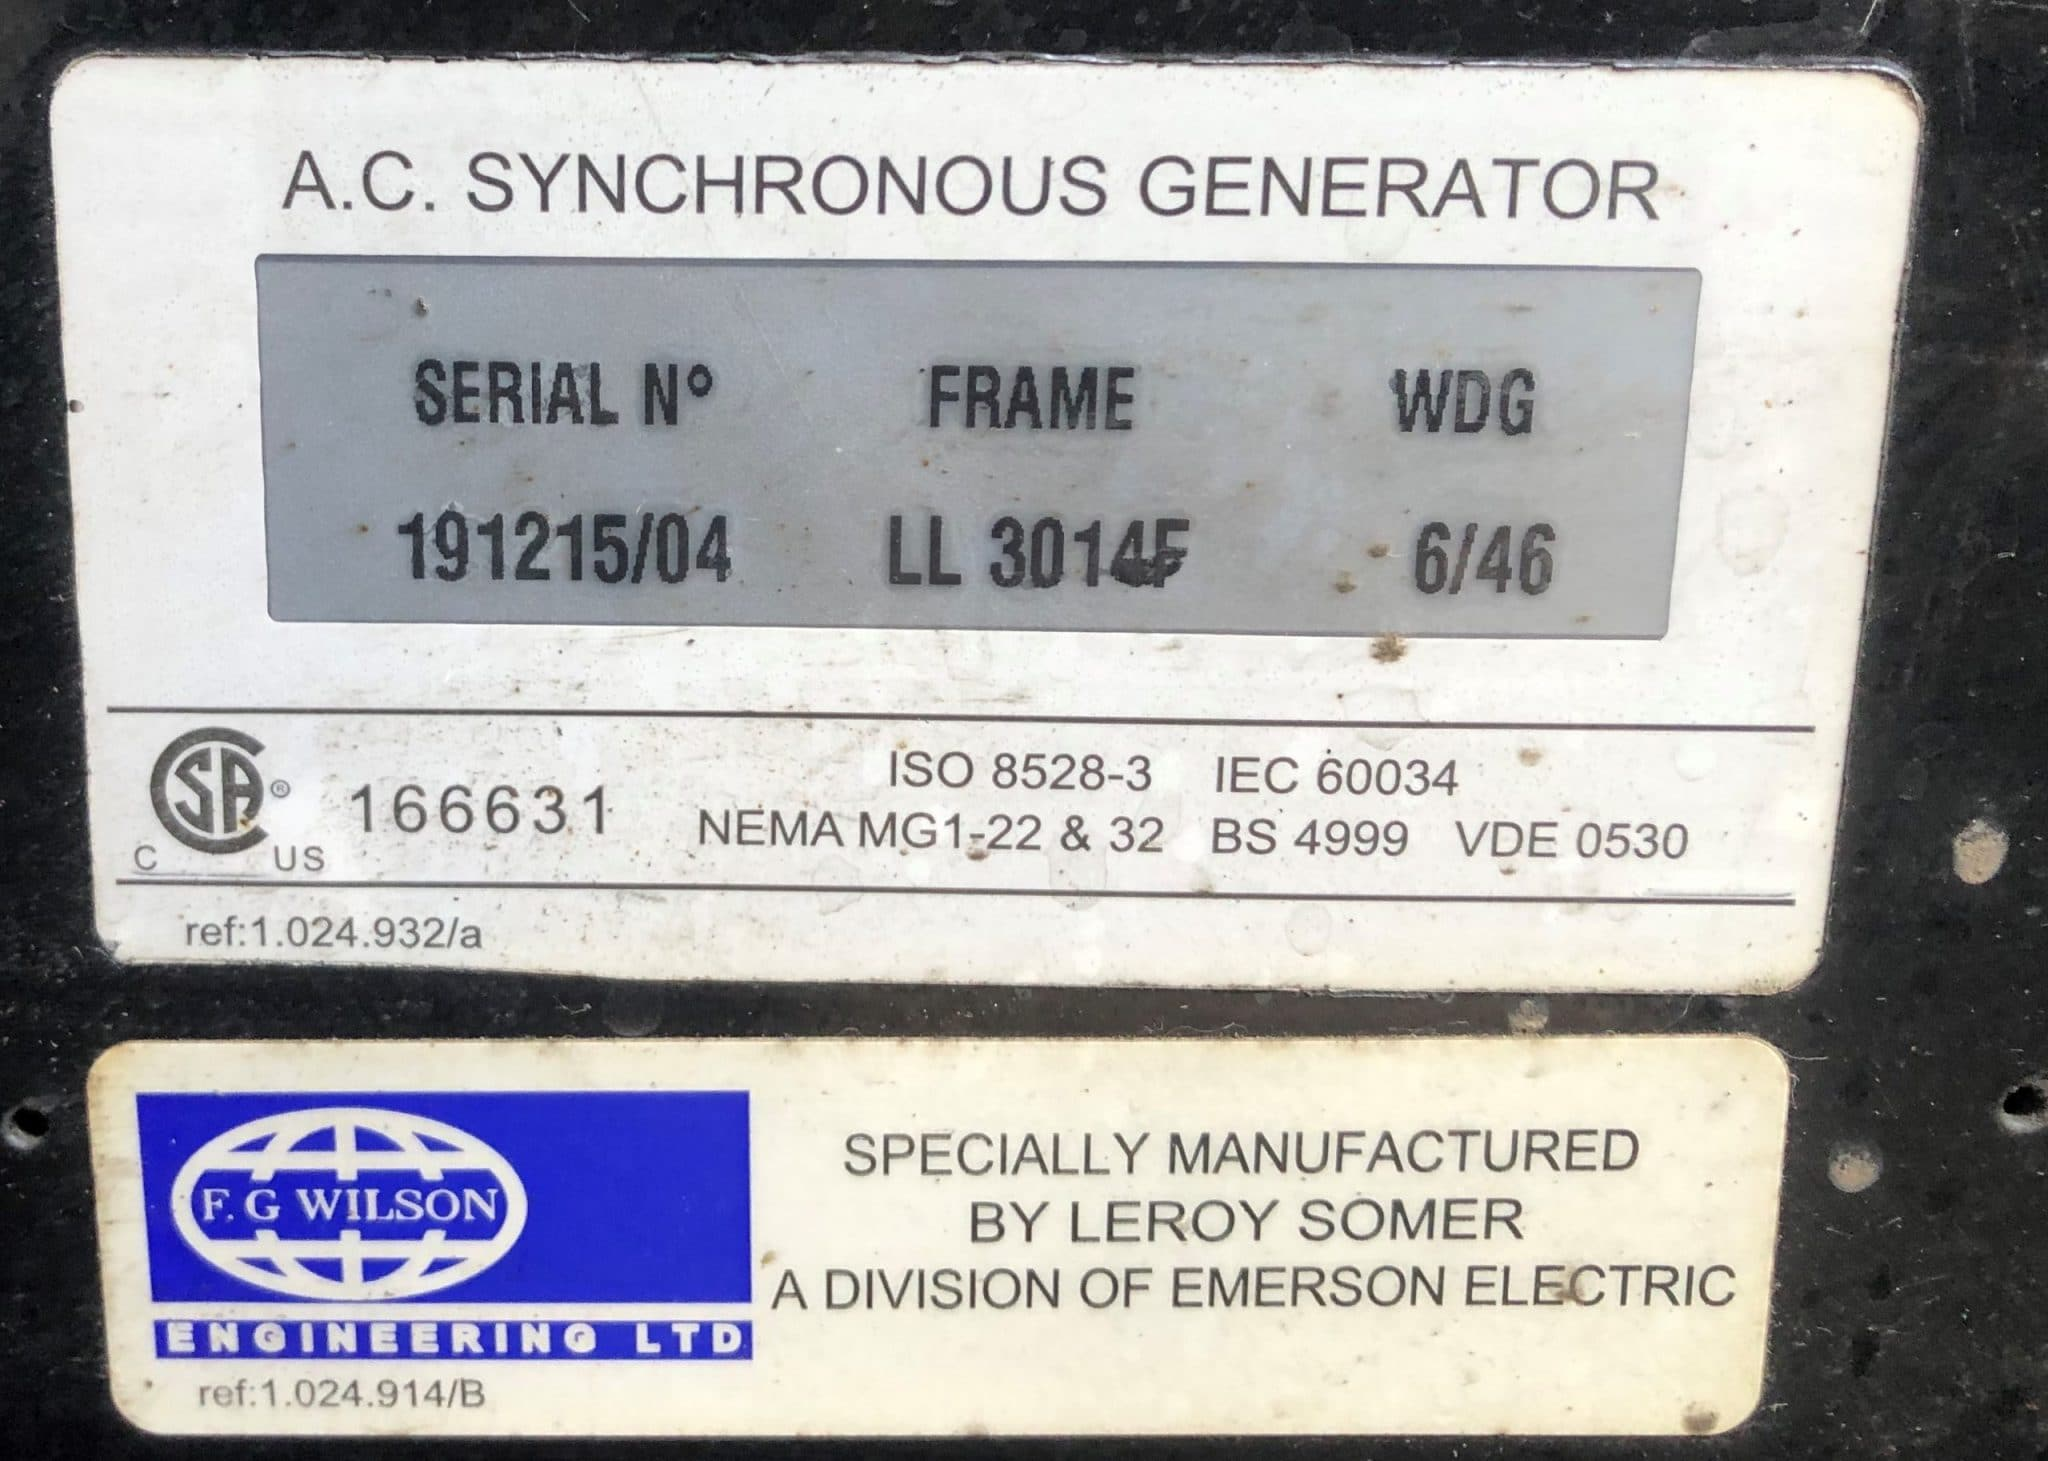 150 Kva Perkins Leroy FG Wilson (Rental Specs) Acoustic Generator 12